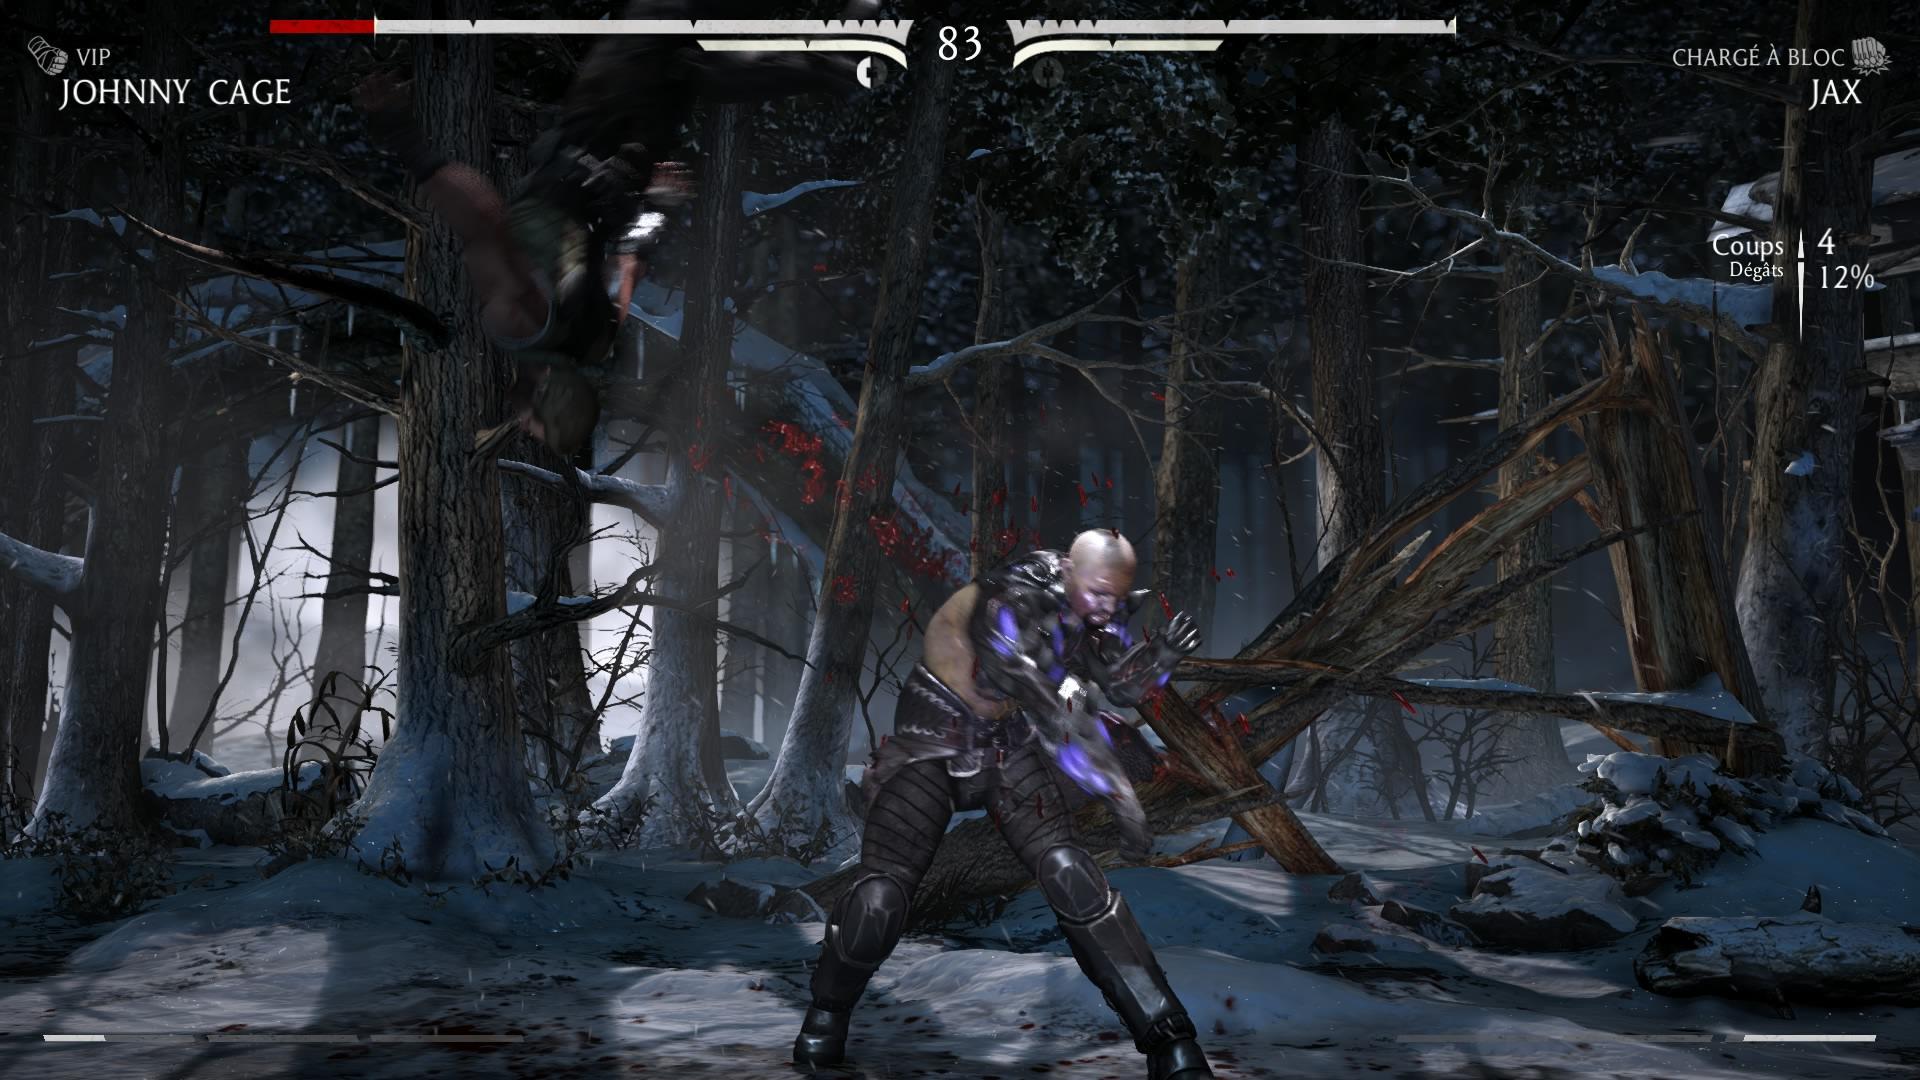 Mortal kombat x red coins online : Star coin guide gw2